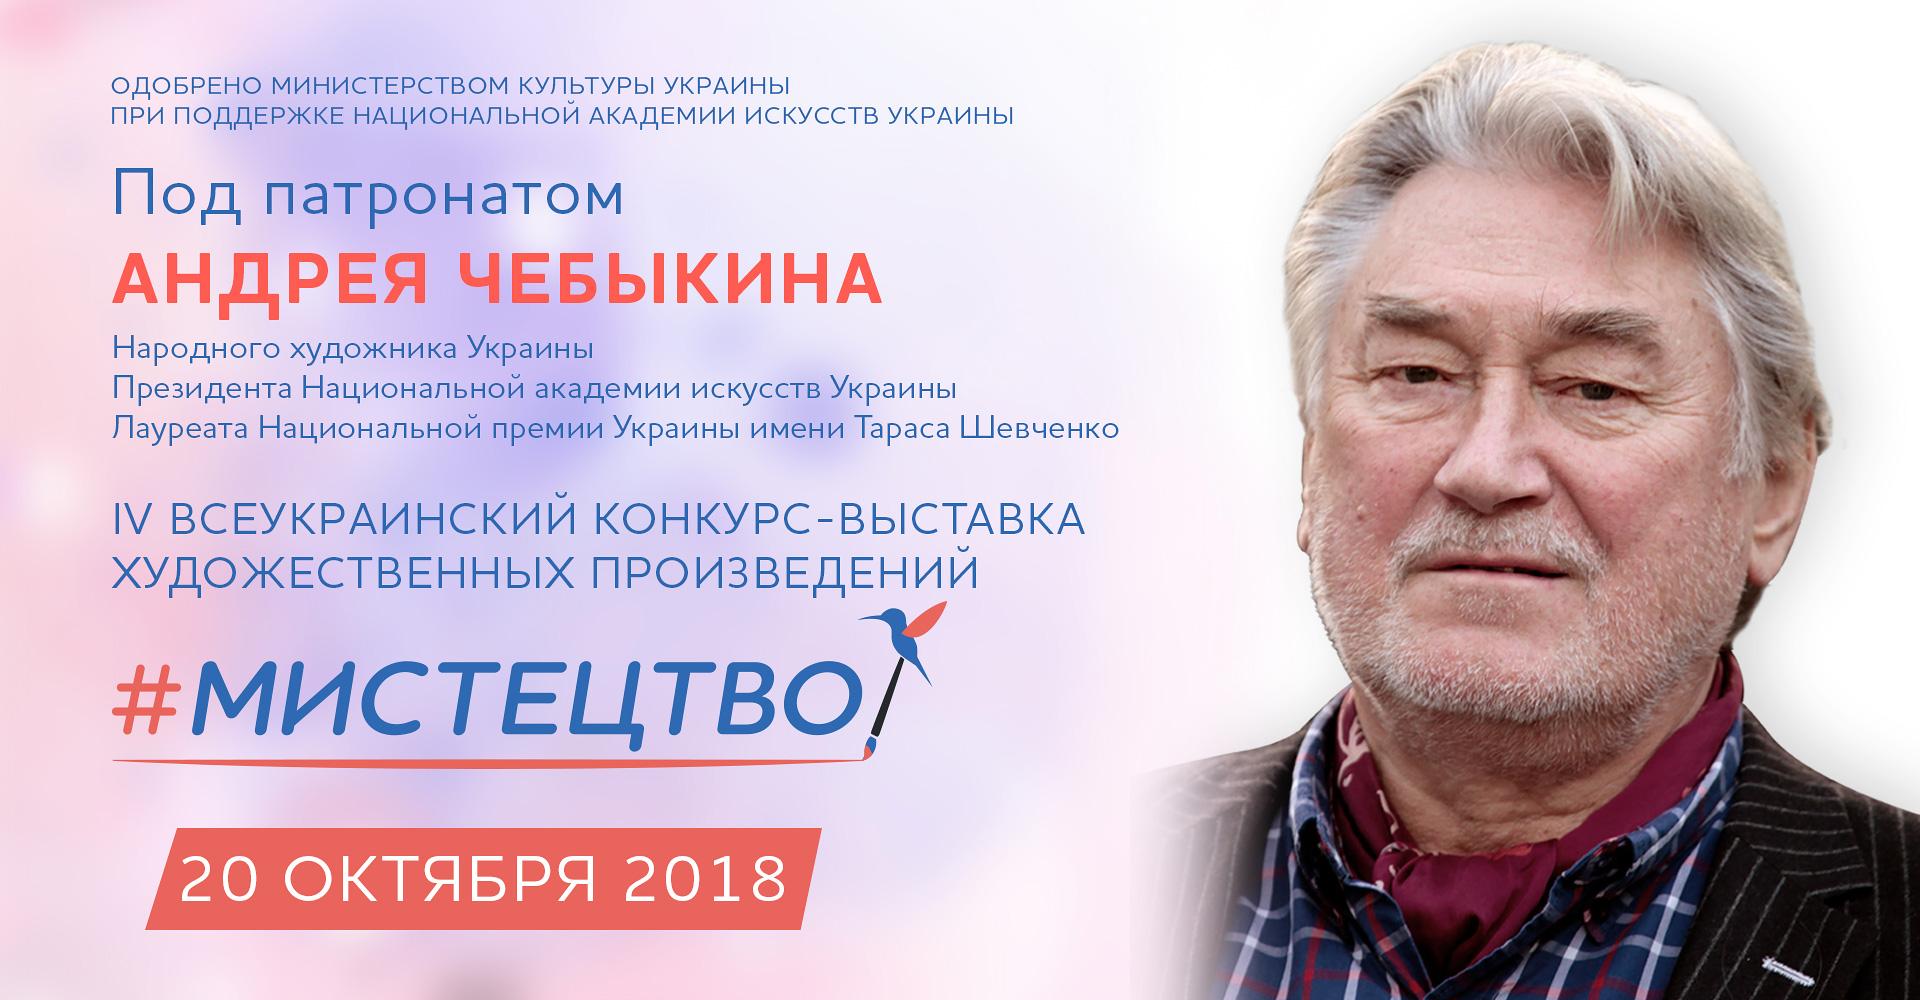 Под патронатом Андрея Чебыкина